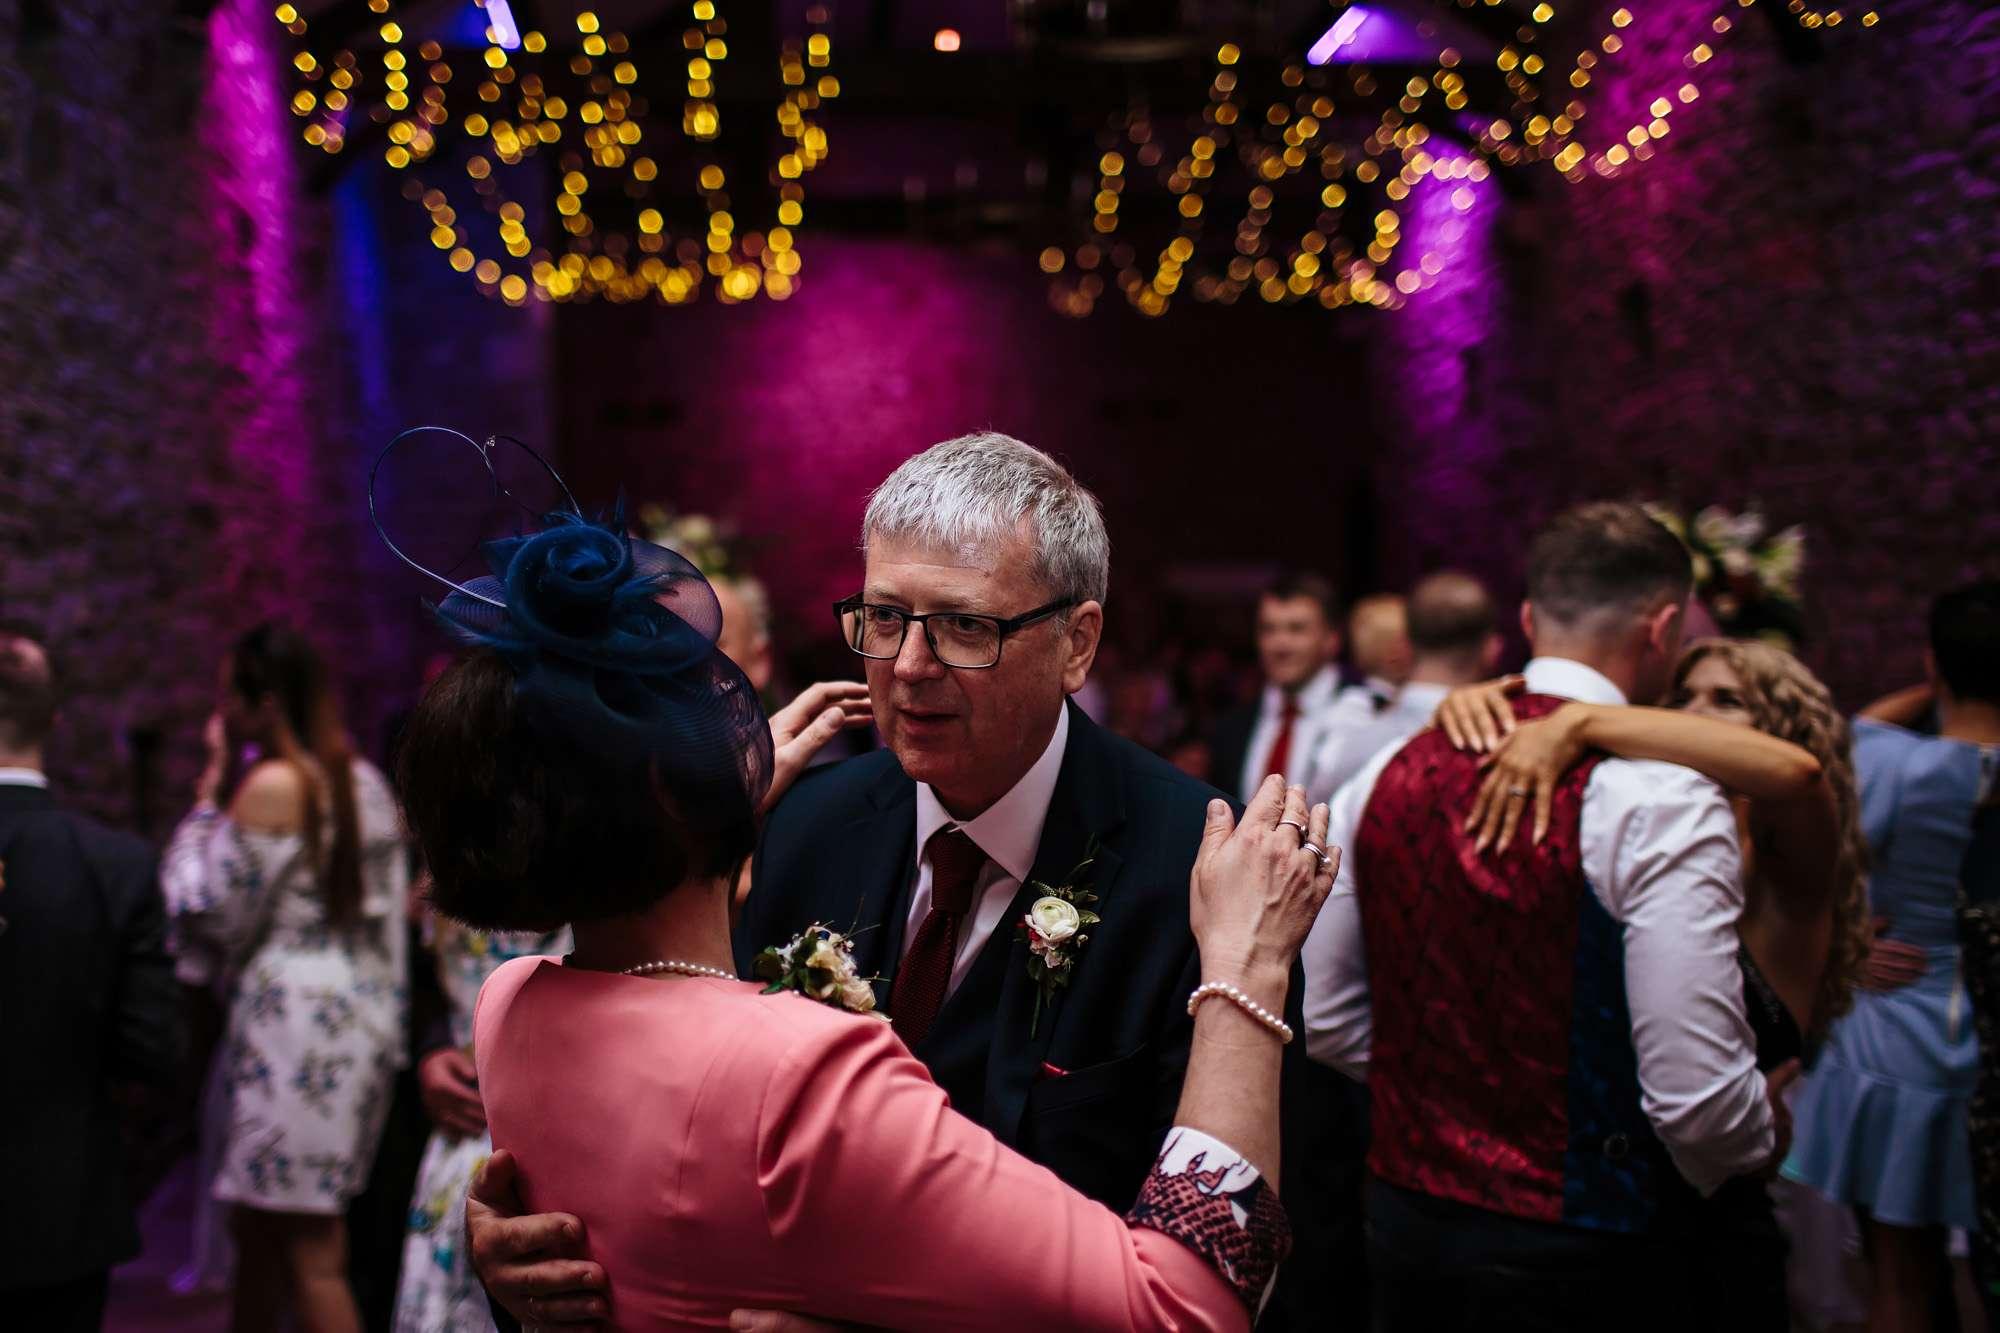 Wedding guests dancing at a Lancashire wedding